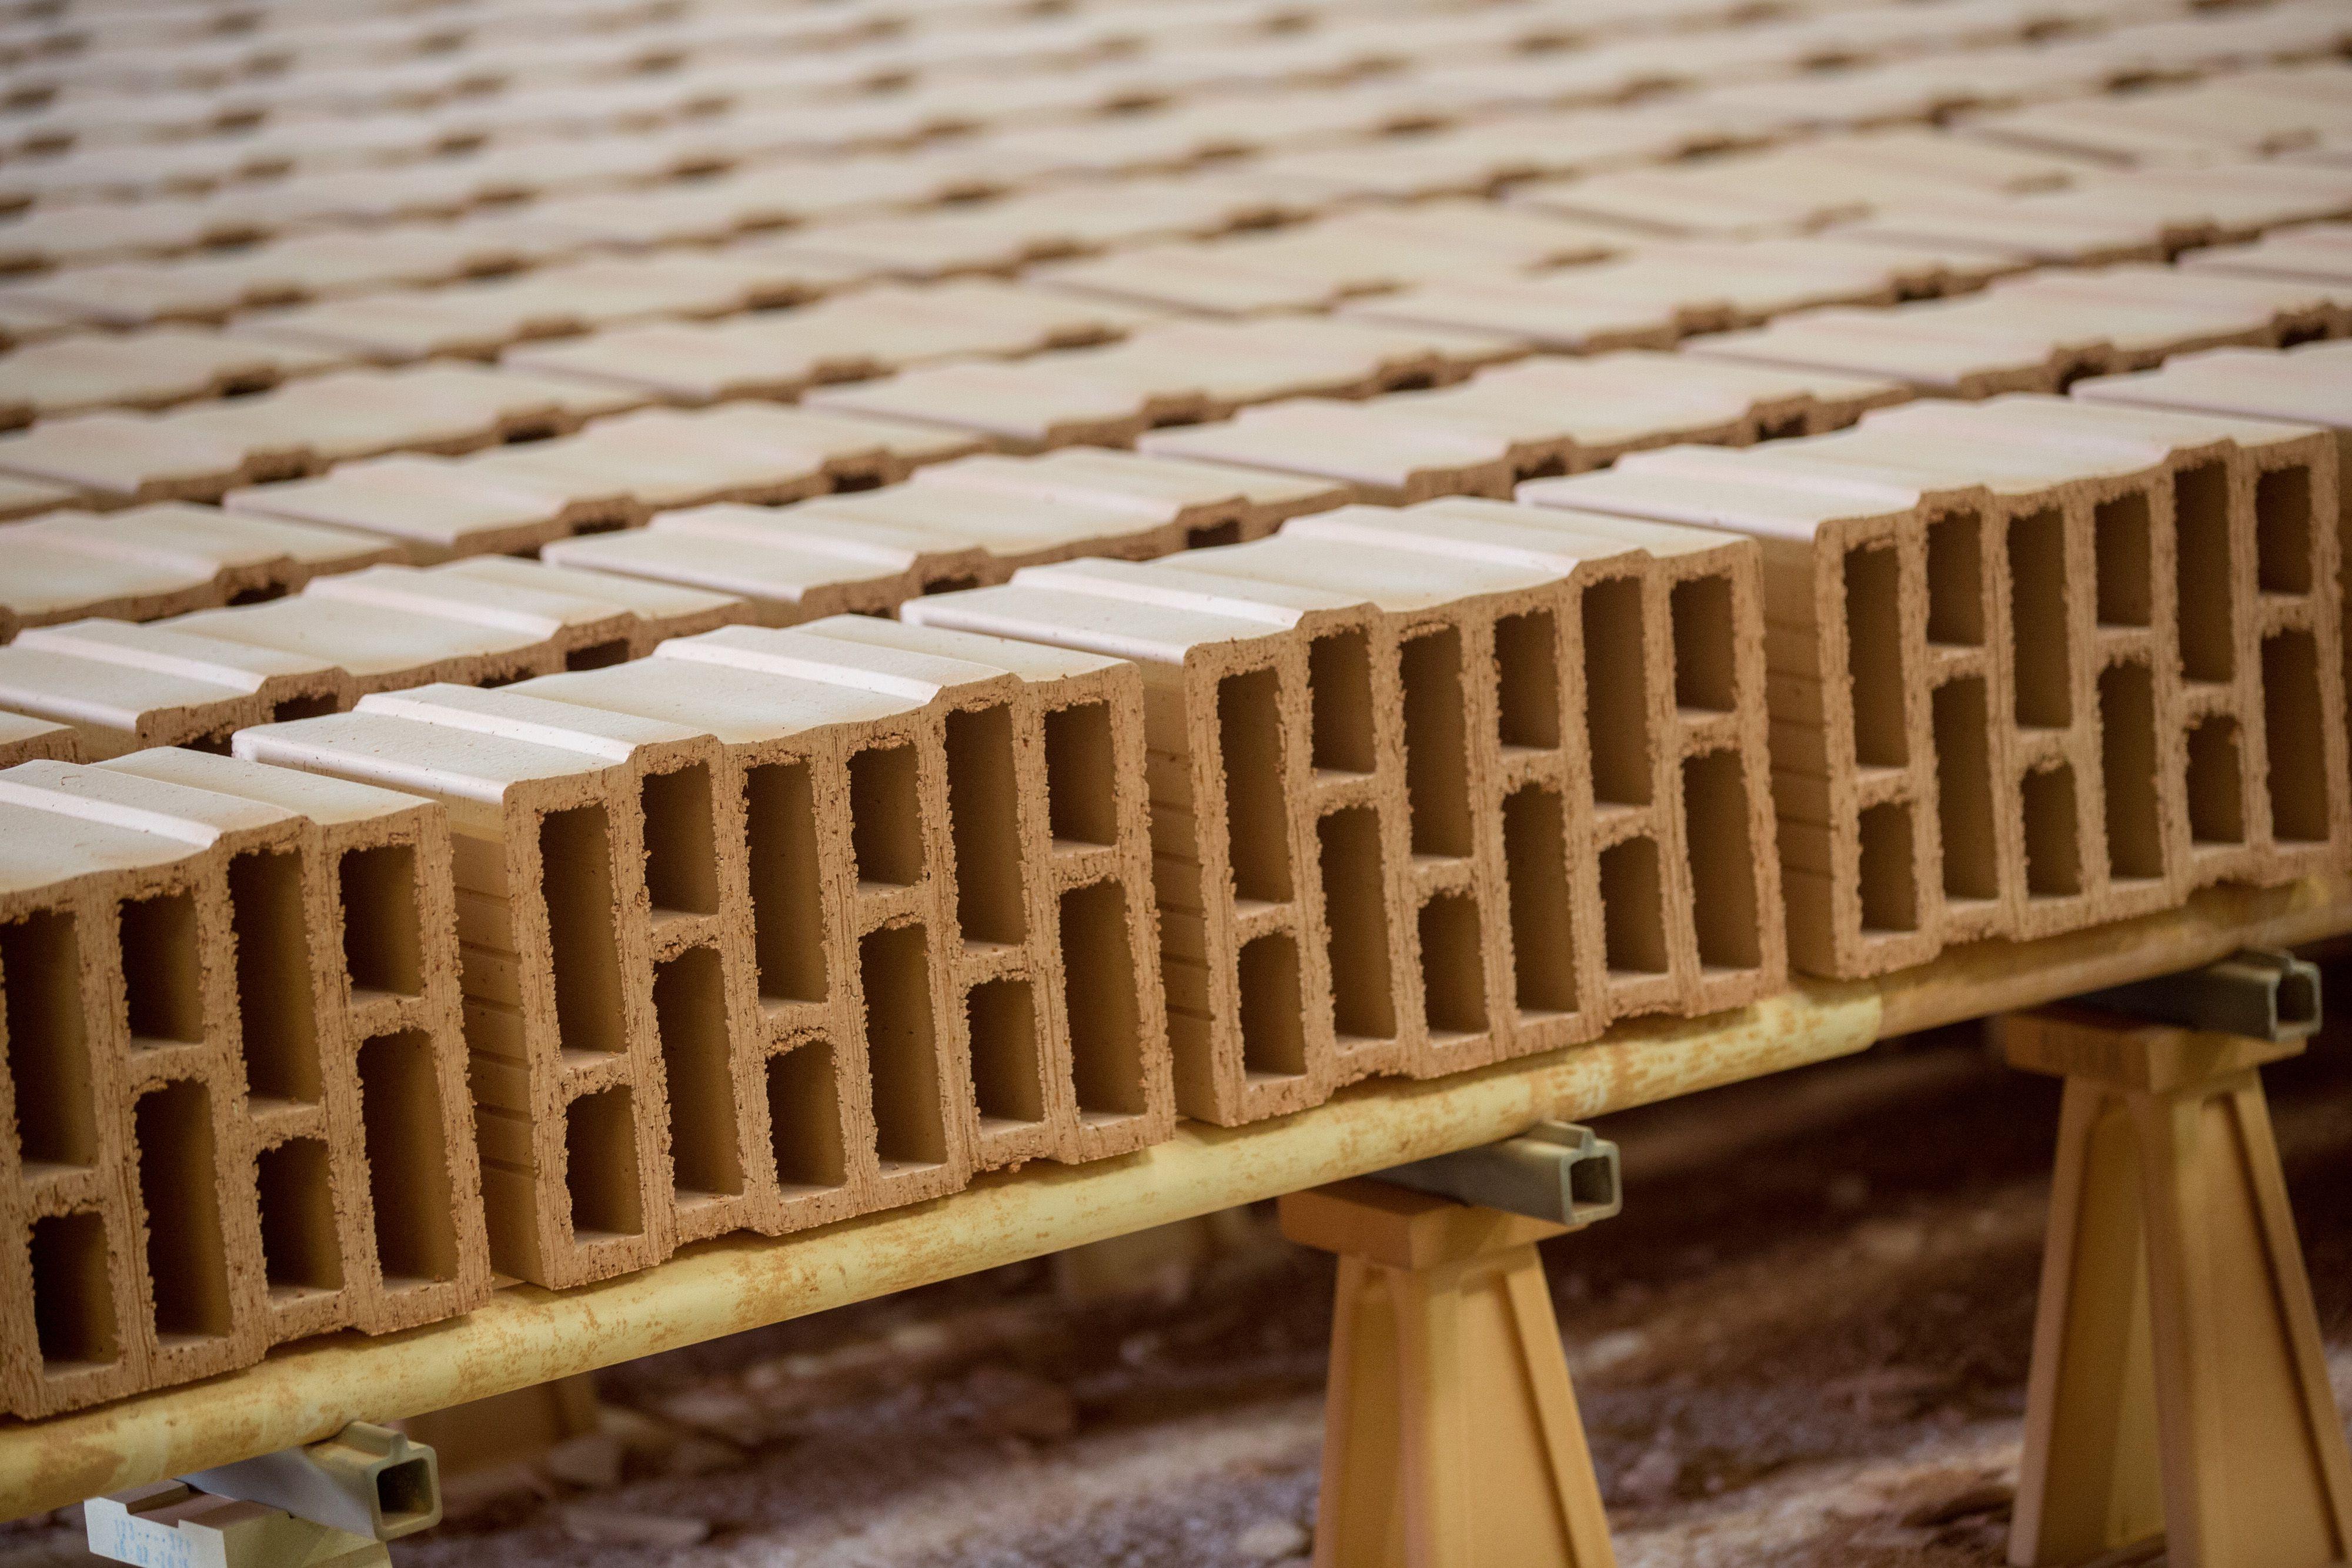 Fired clay bricks sit on a kiln car at a brickmaking plant